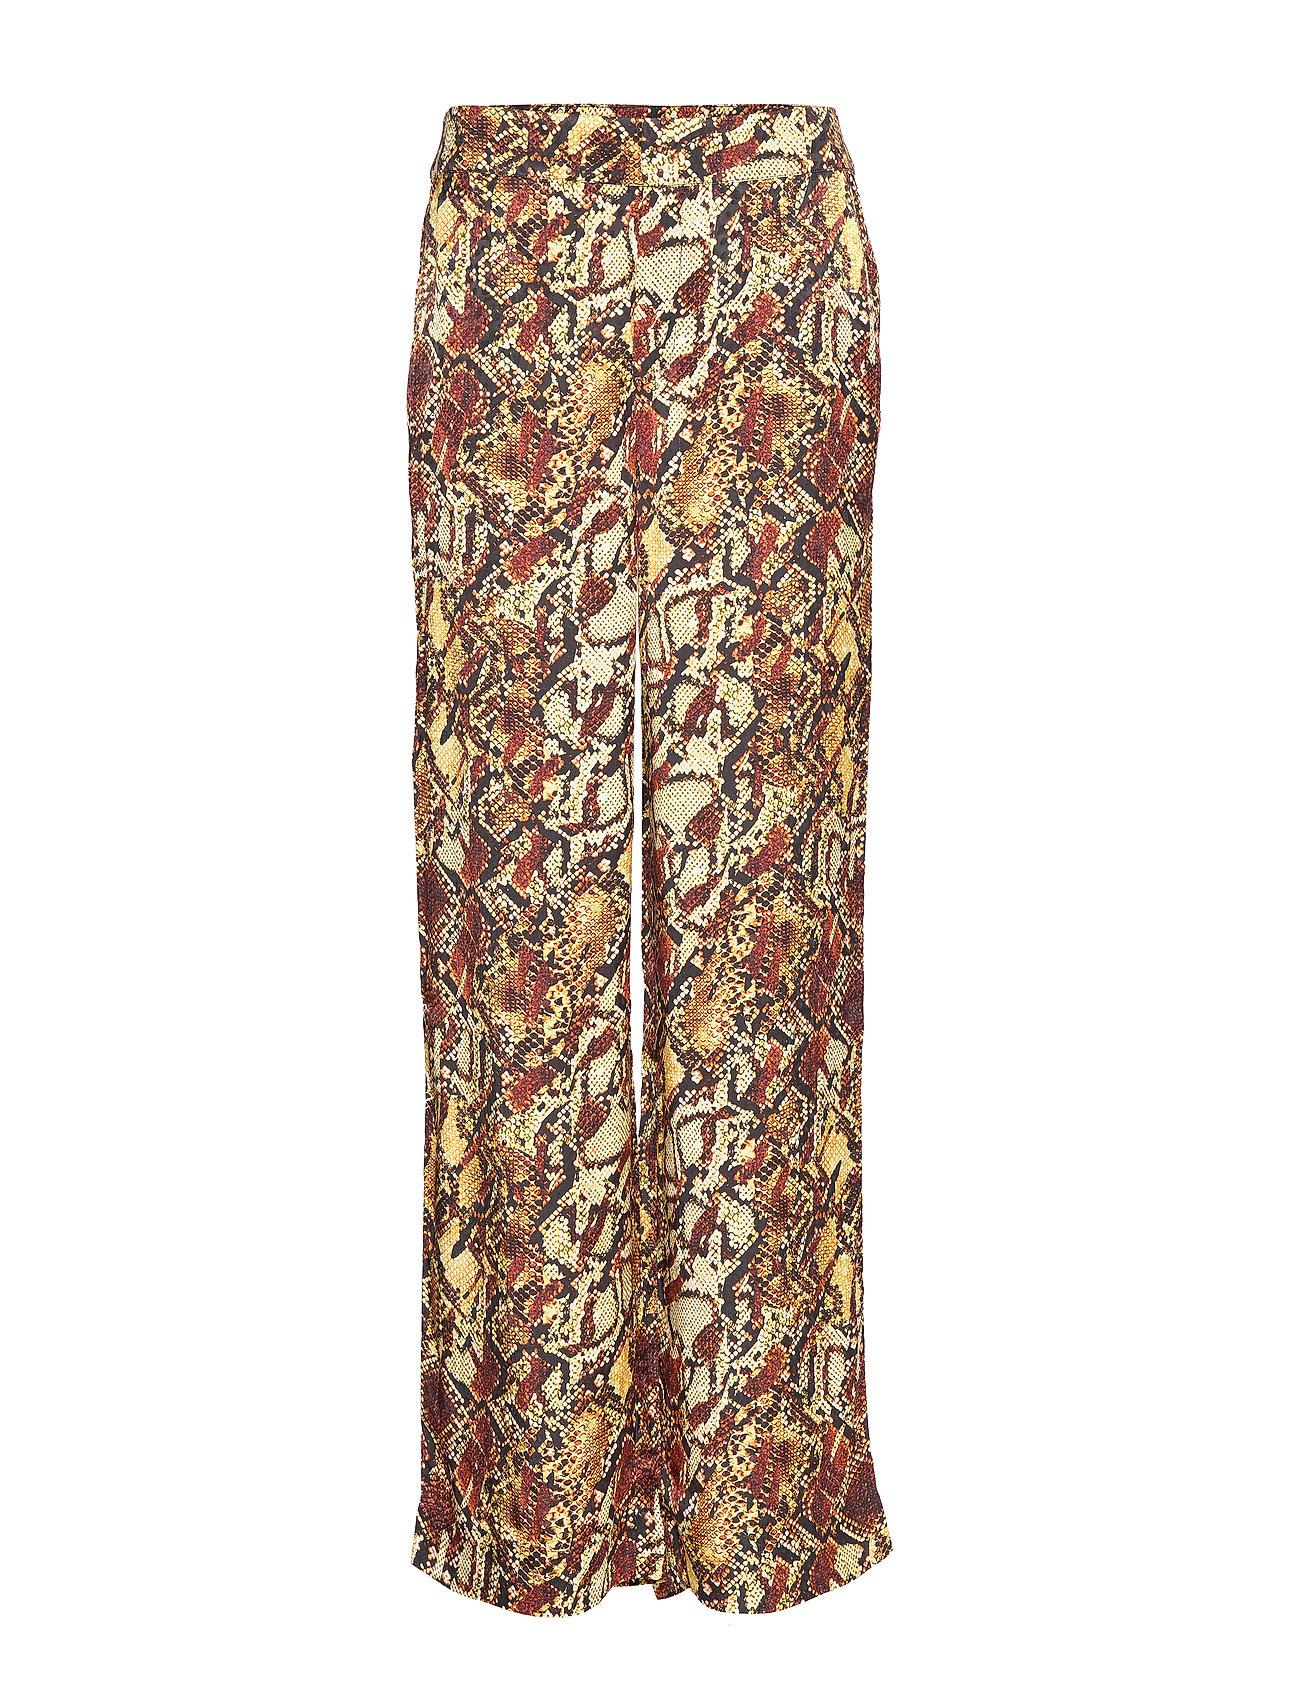 Gestuz ChellaGZ pants MA19 - RED/YELLOW SNAKE